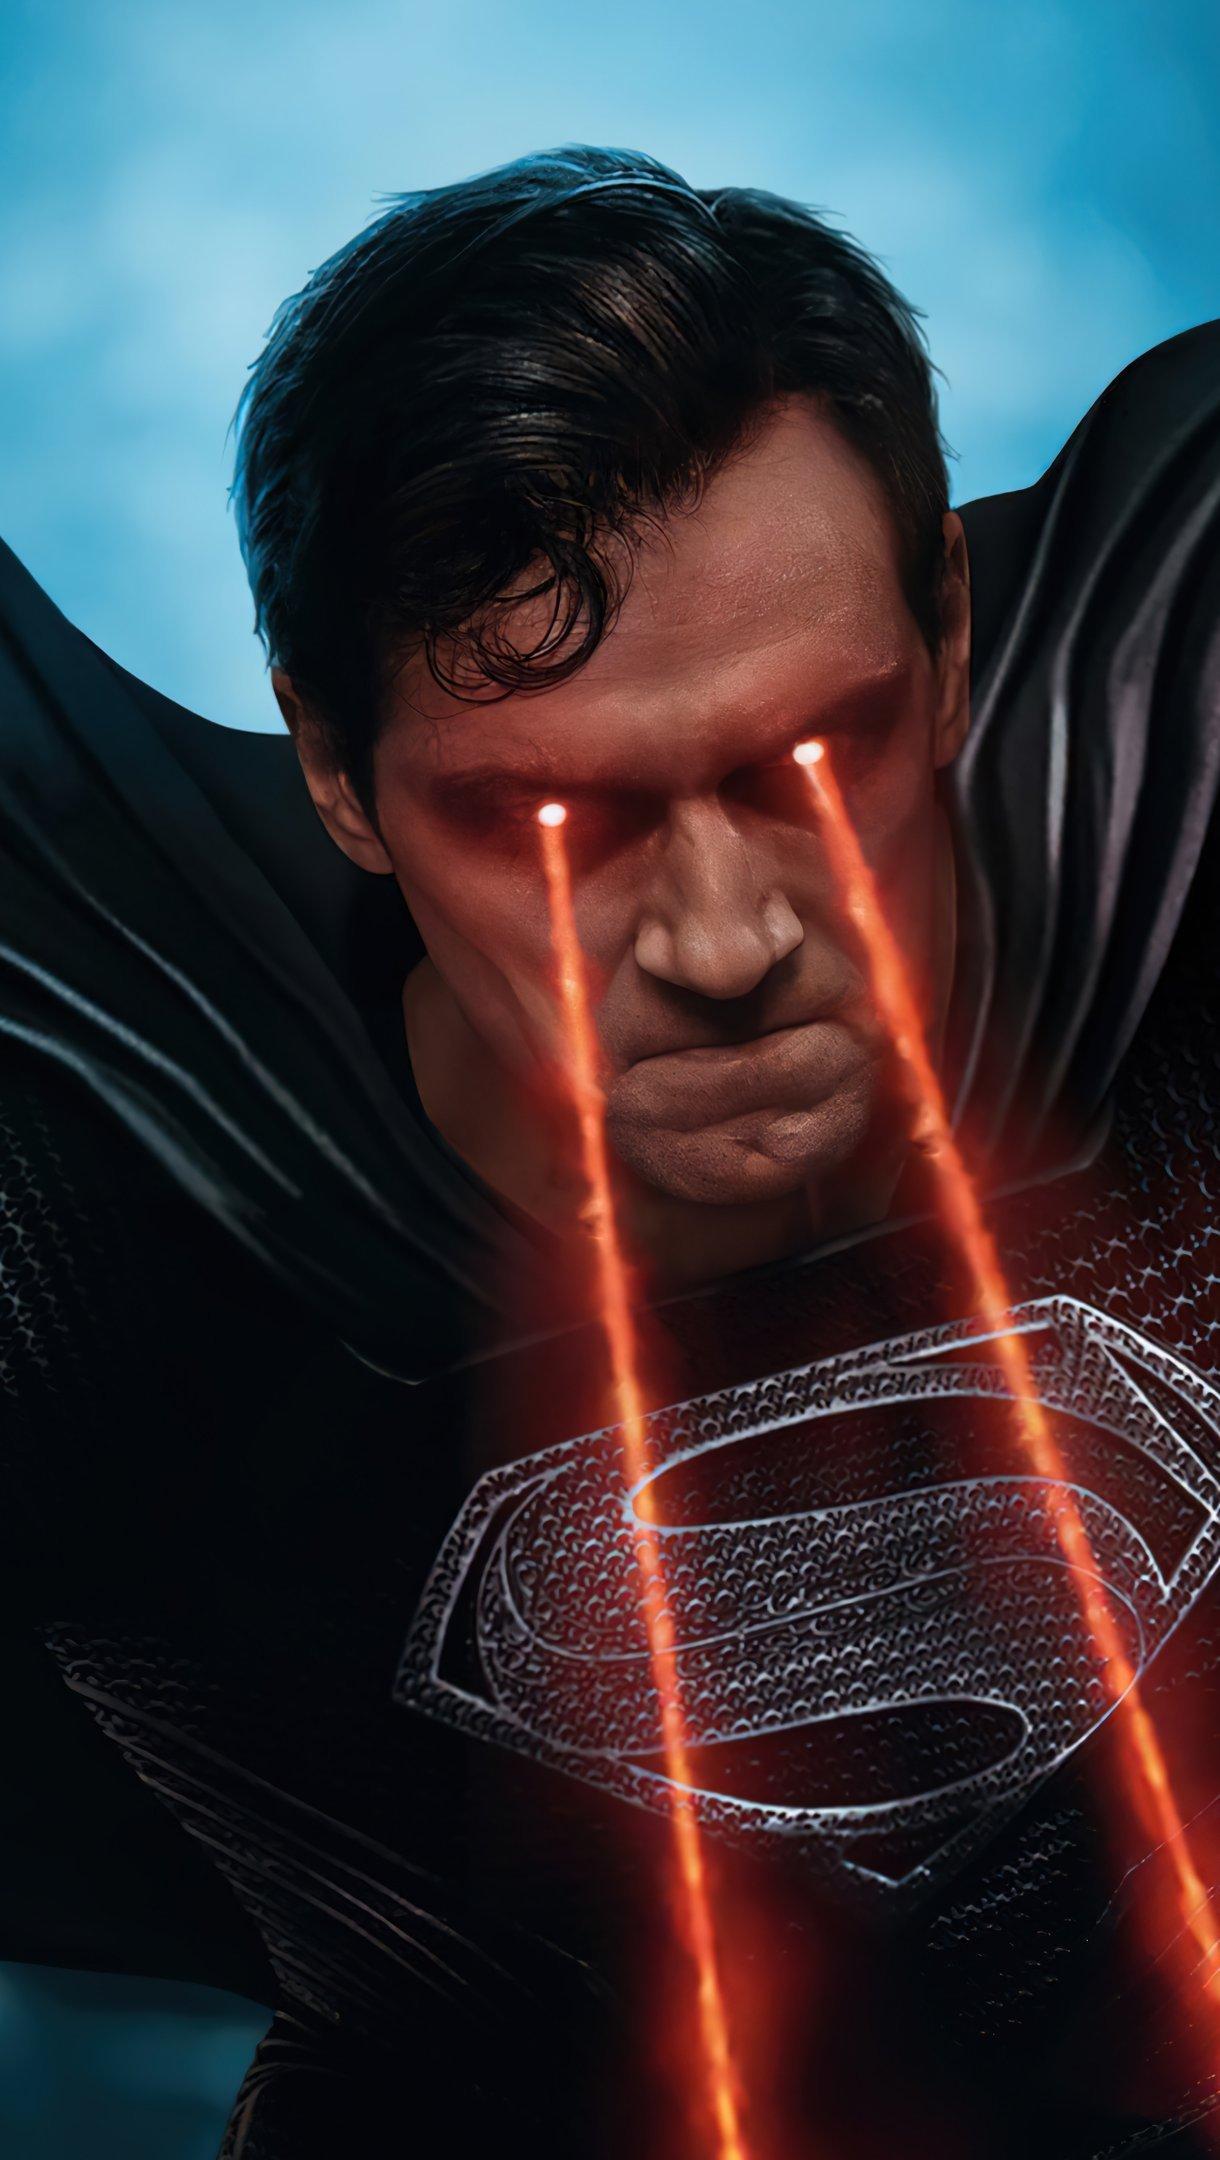 Fondos de pantalla Superman traje negro Liga de la justicia Snyder cut Vertical